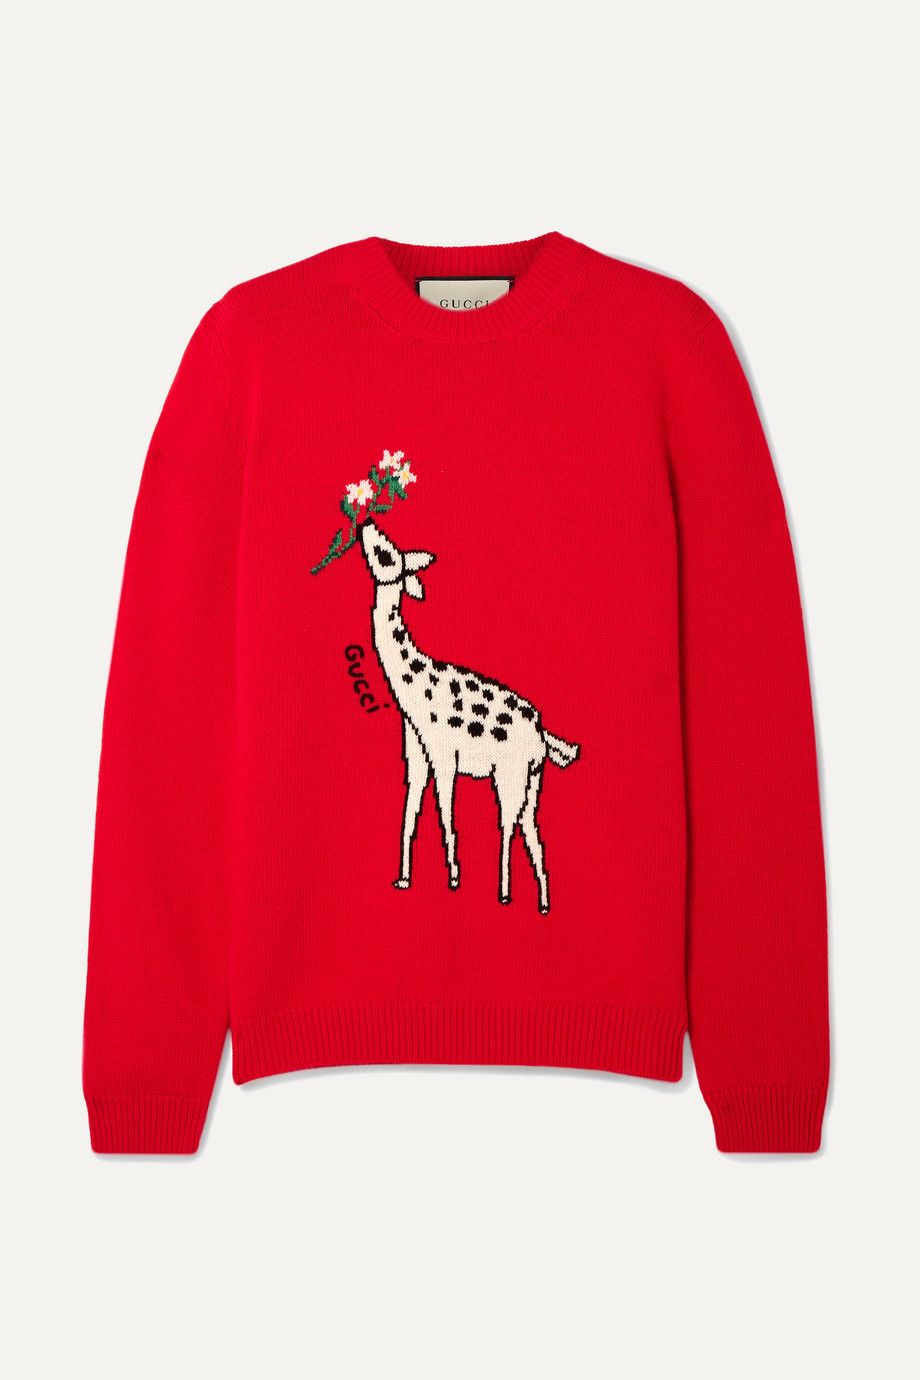 Gucci Embroidered intarsia wool sweater